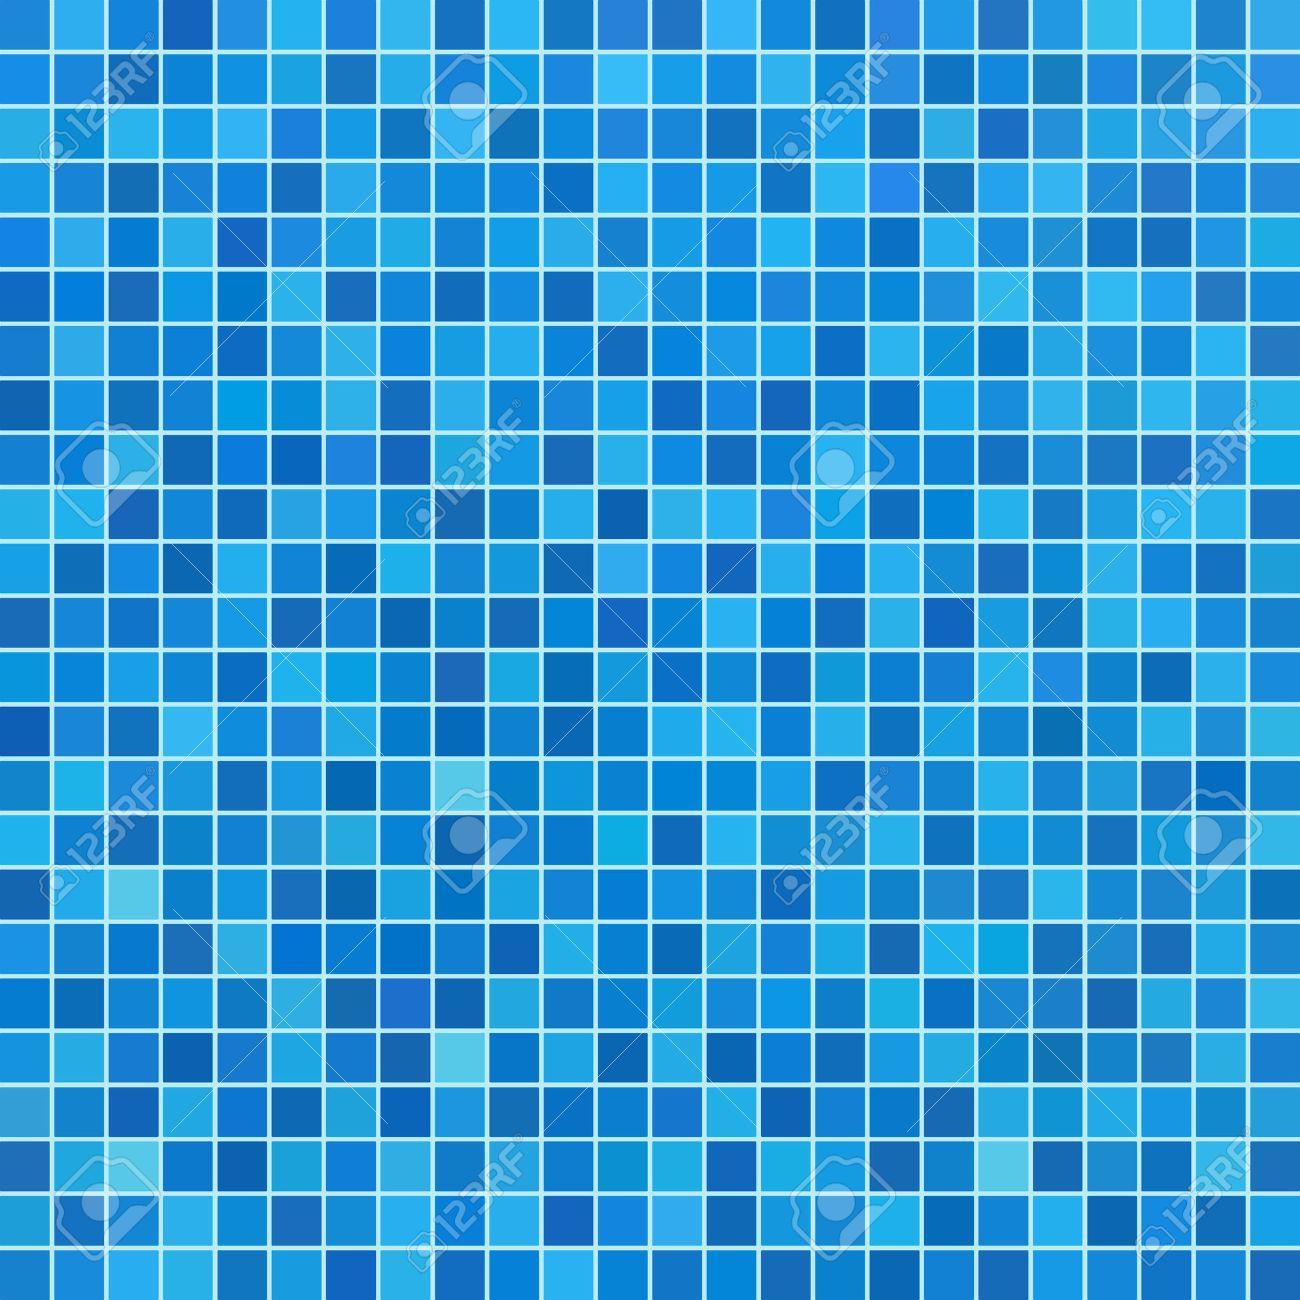 Blue ceramic tile mosaic in swimming pool - 33077682